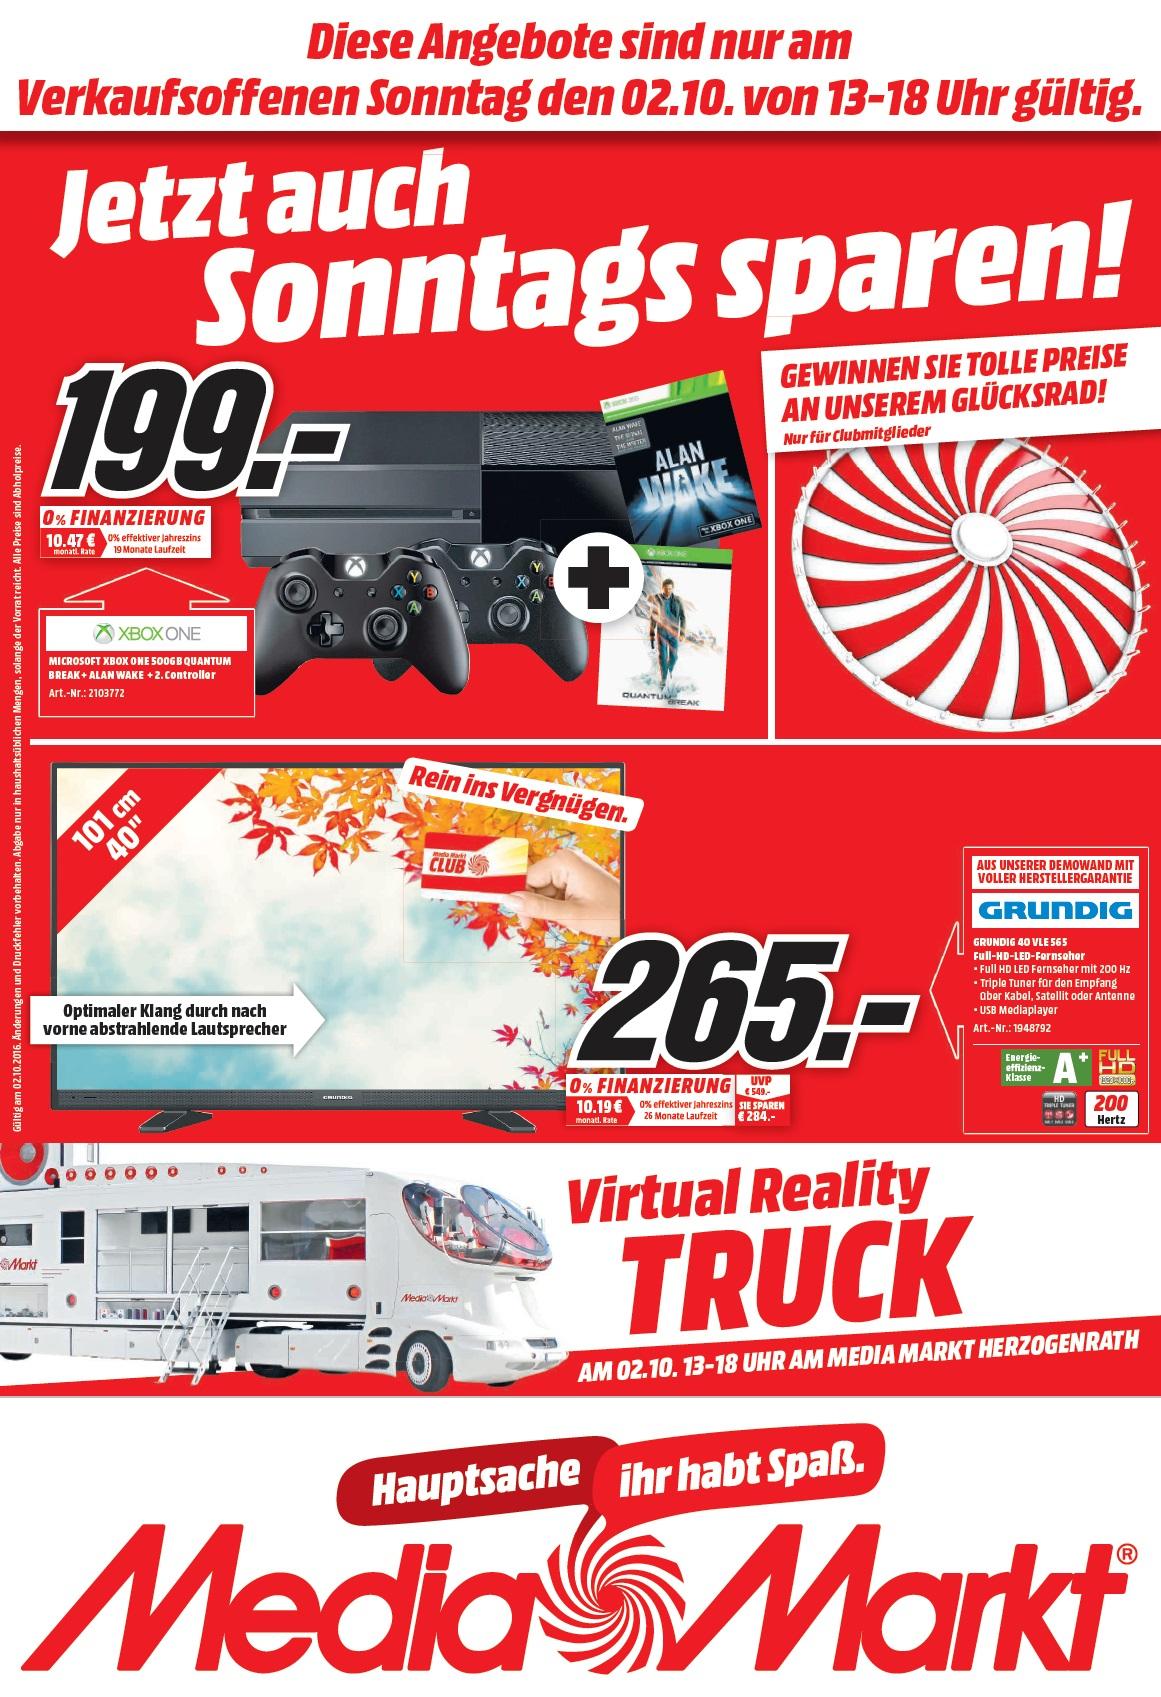 Lokal Media Markt Herzogenrath Diverse Angebote z.B. X-Box One 500GB + Alan Wake + Quantum Break + 2. Controller 199€